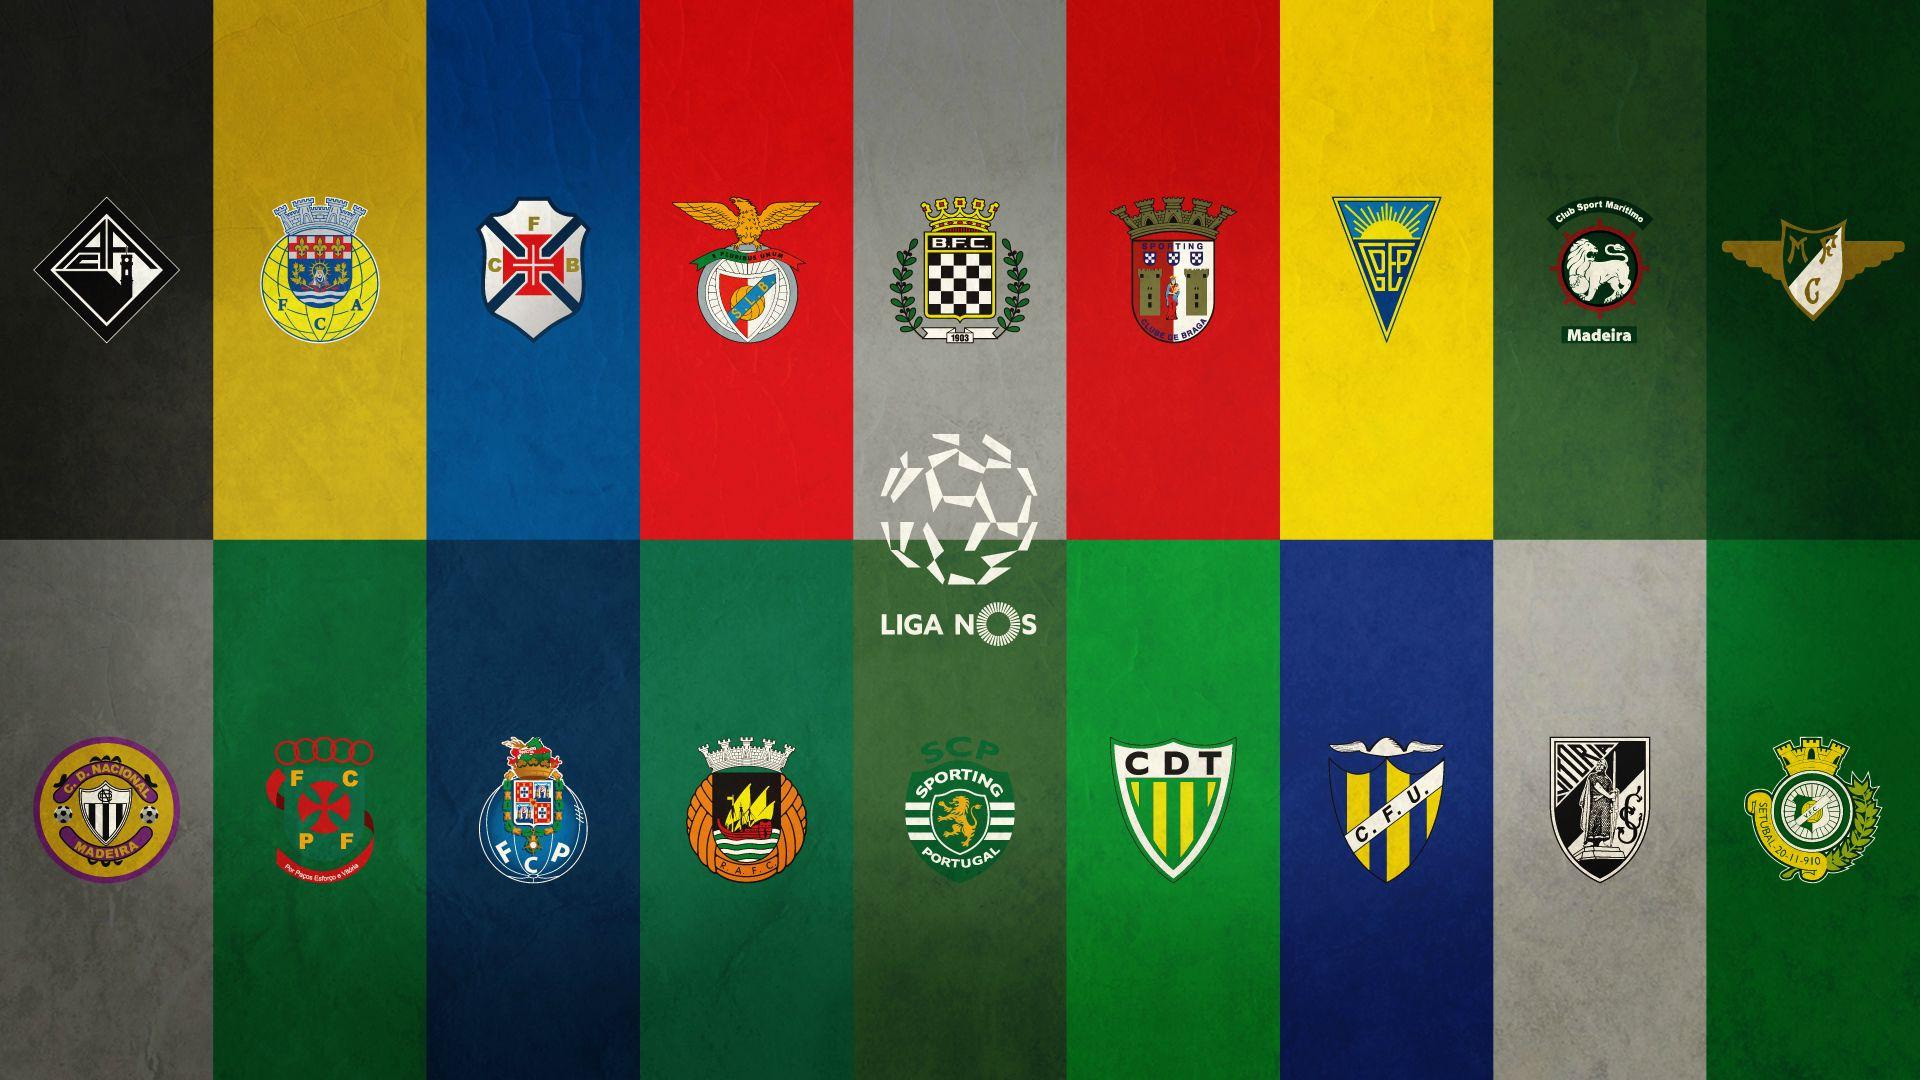 Moreirense VS Estoril ( BETTING TIPS, Match Preview & Expert Analysis )